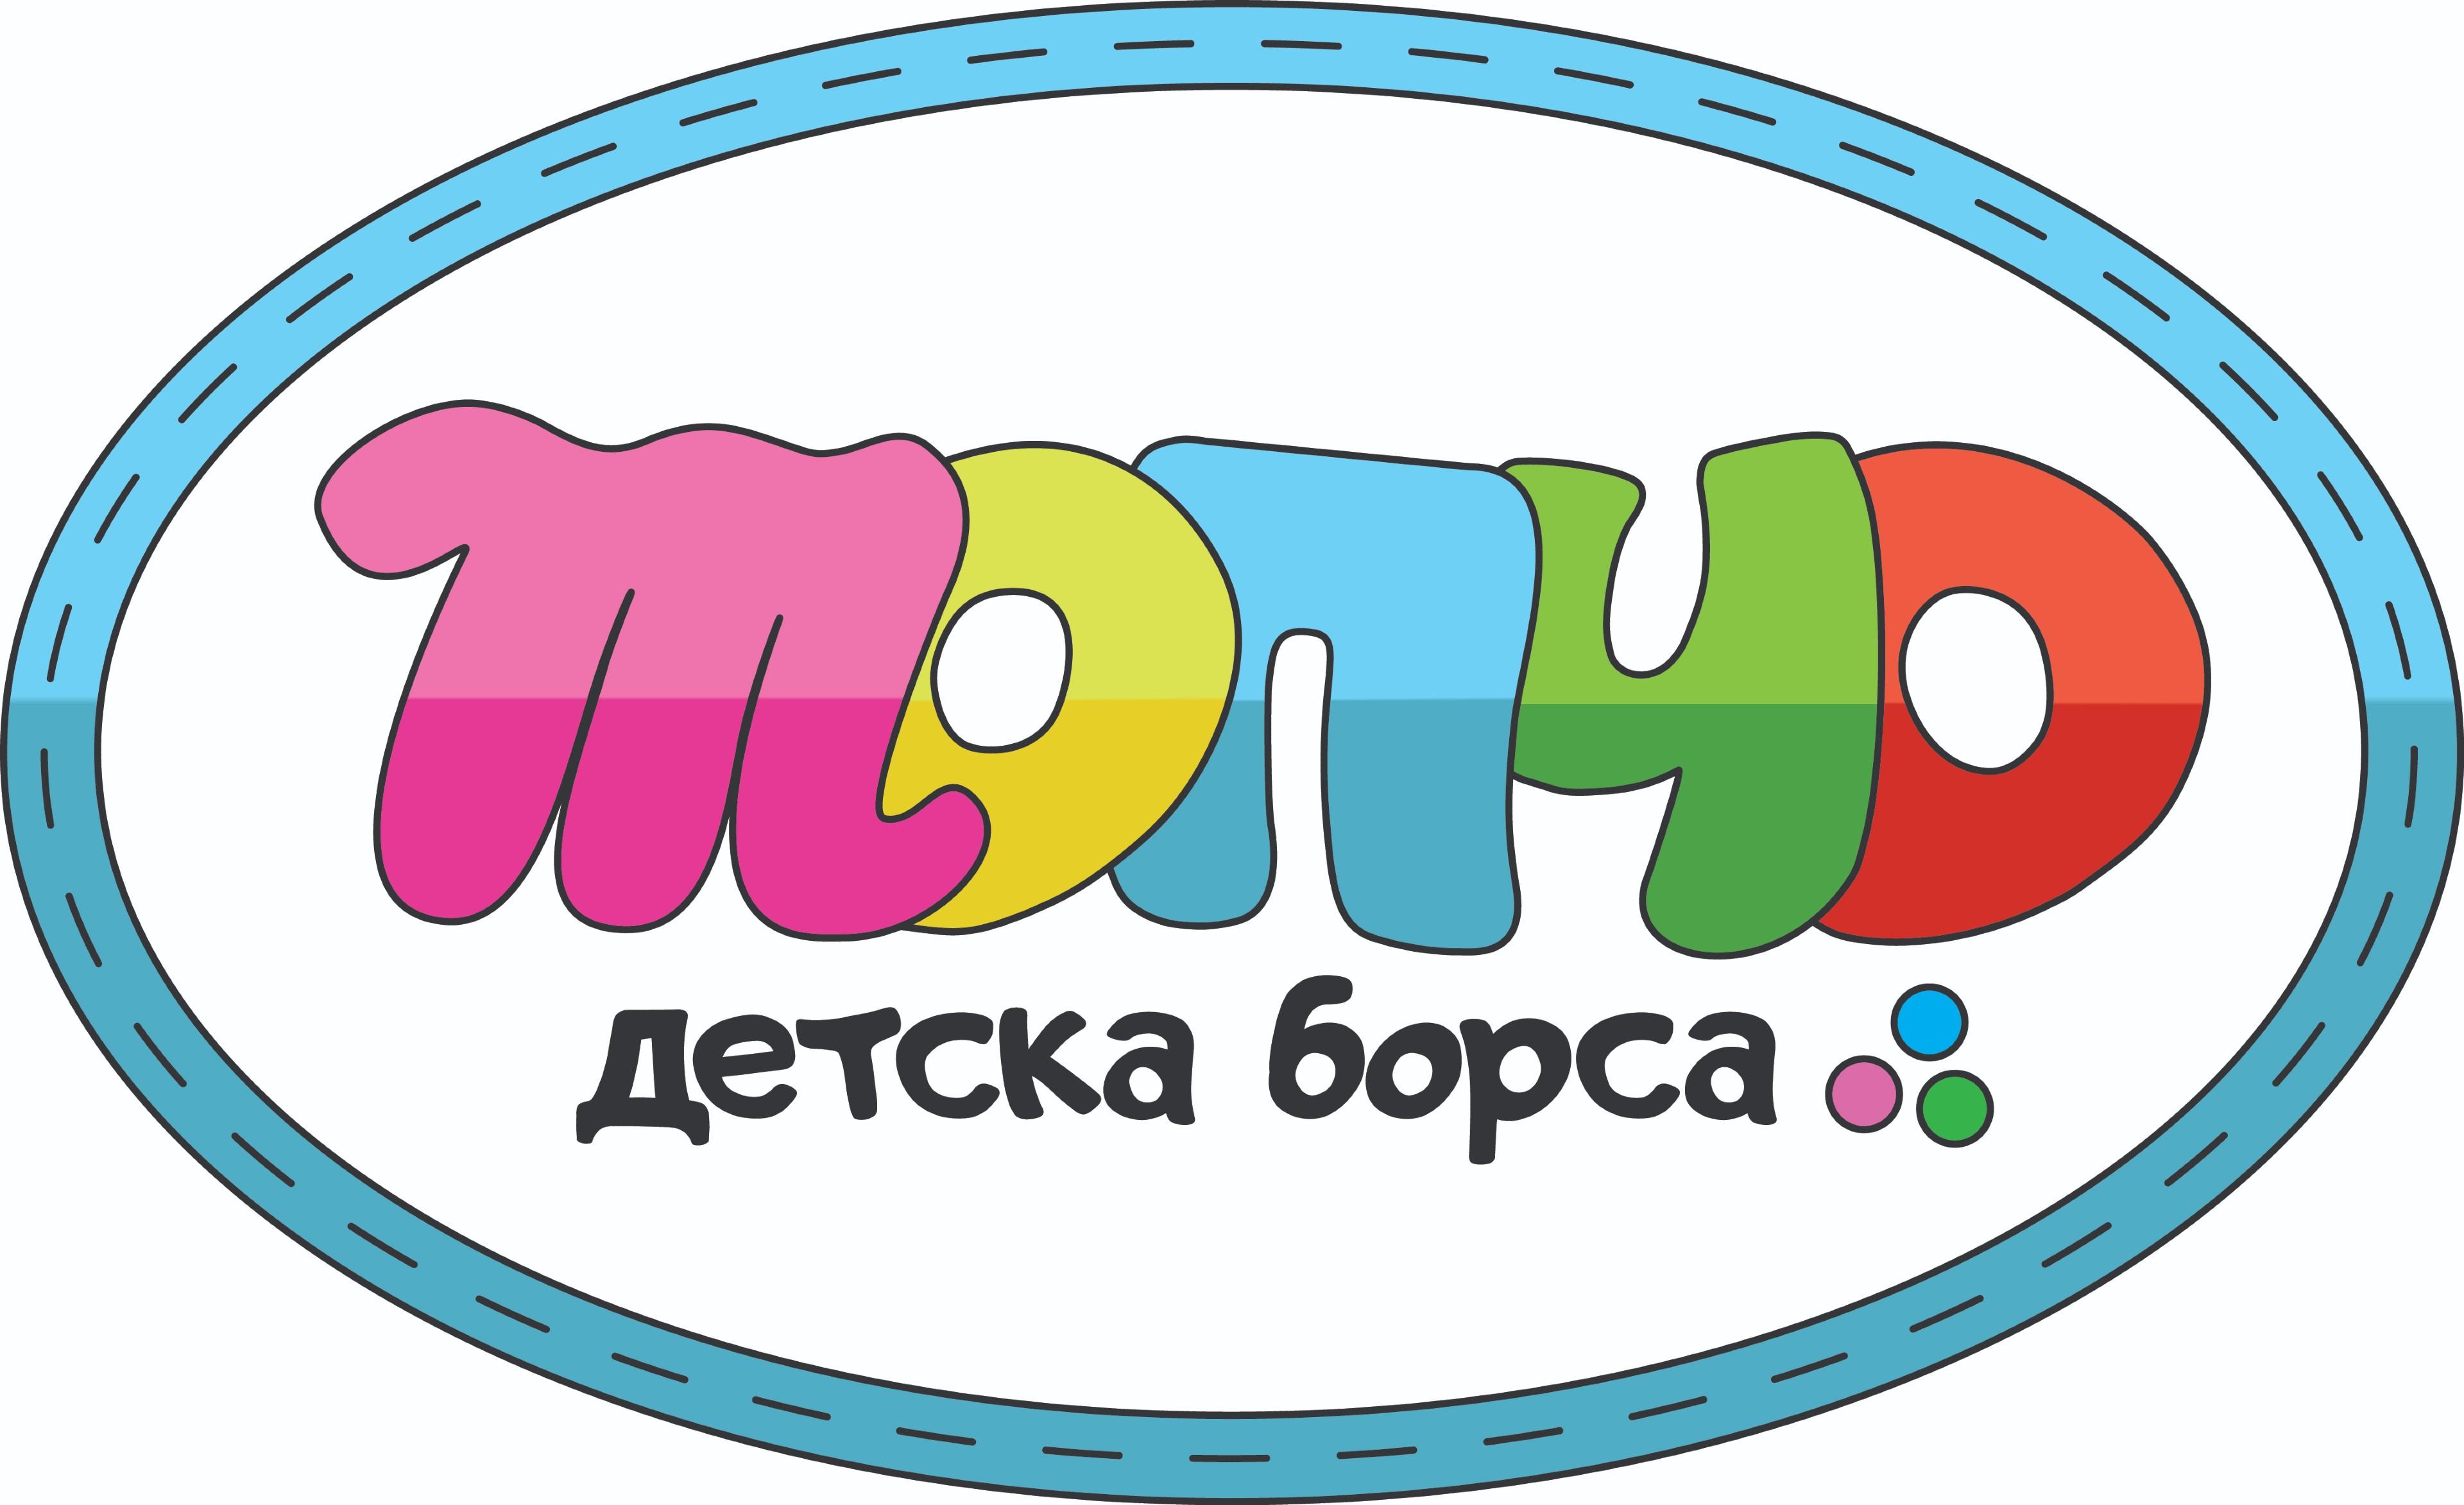 Детска борса Топчо